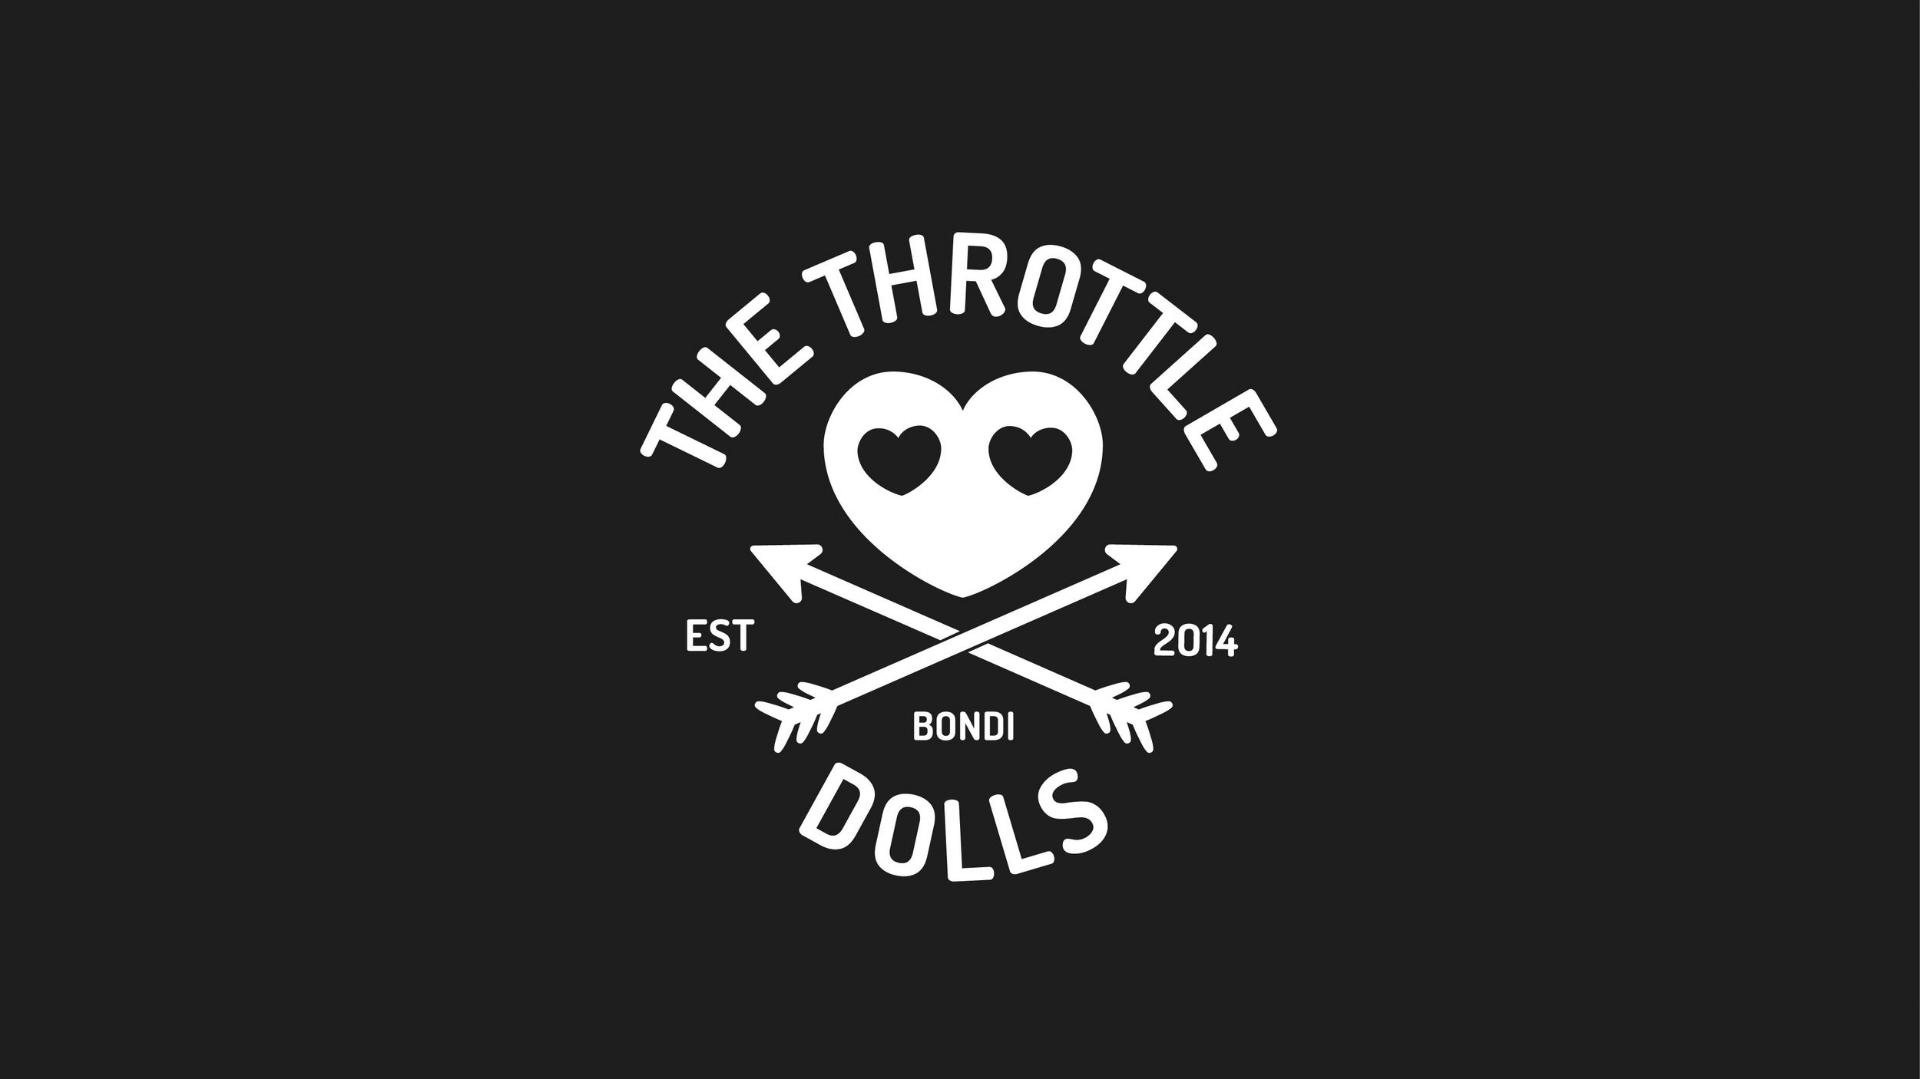 Nico_Gray_Design_The_Throttle_Dolls_logo.jpg